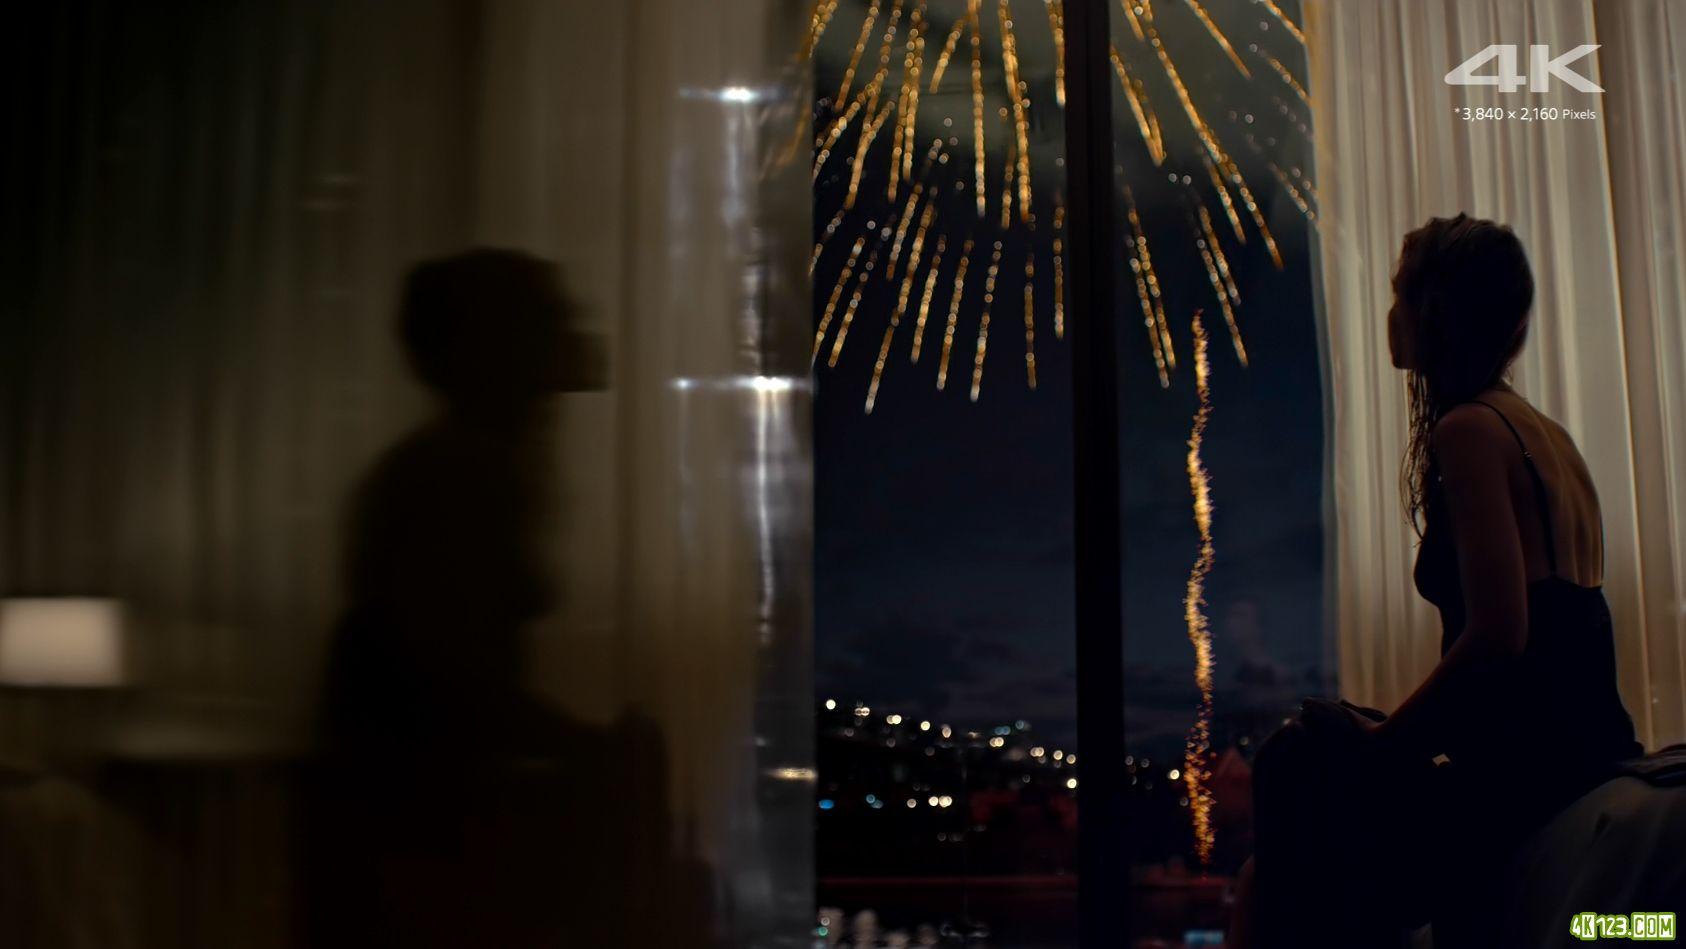 SONY.4K.DEMO_Fireworks.mkv_2017_02.jpg